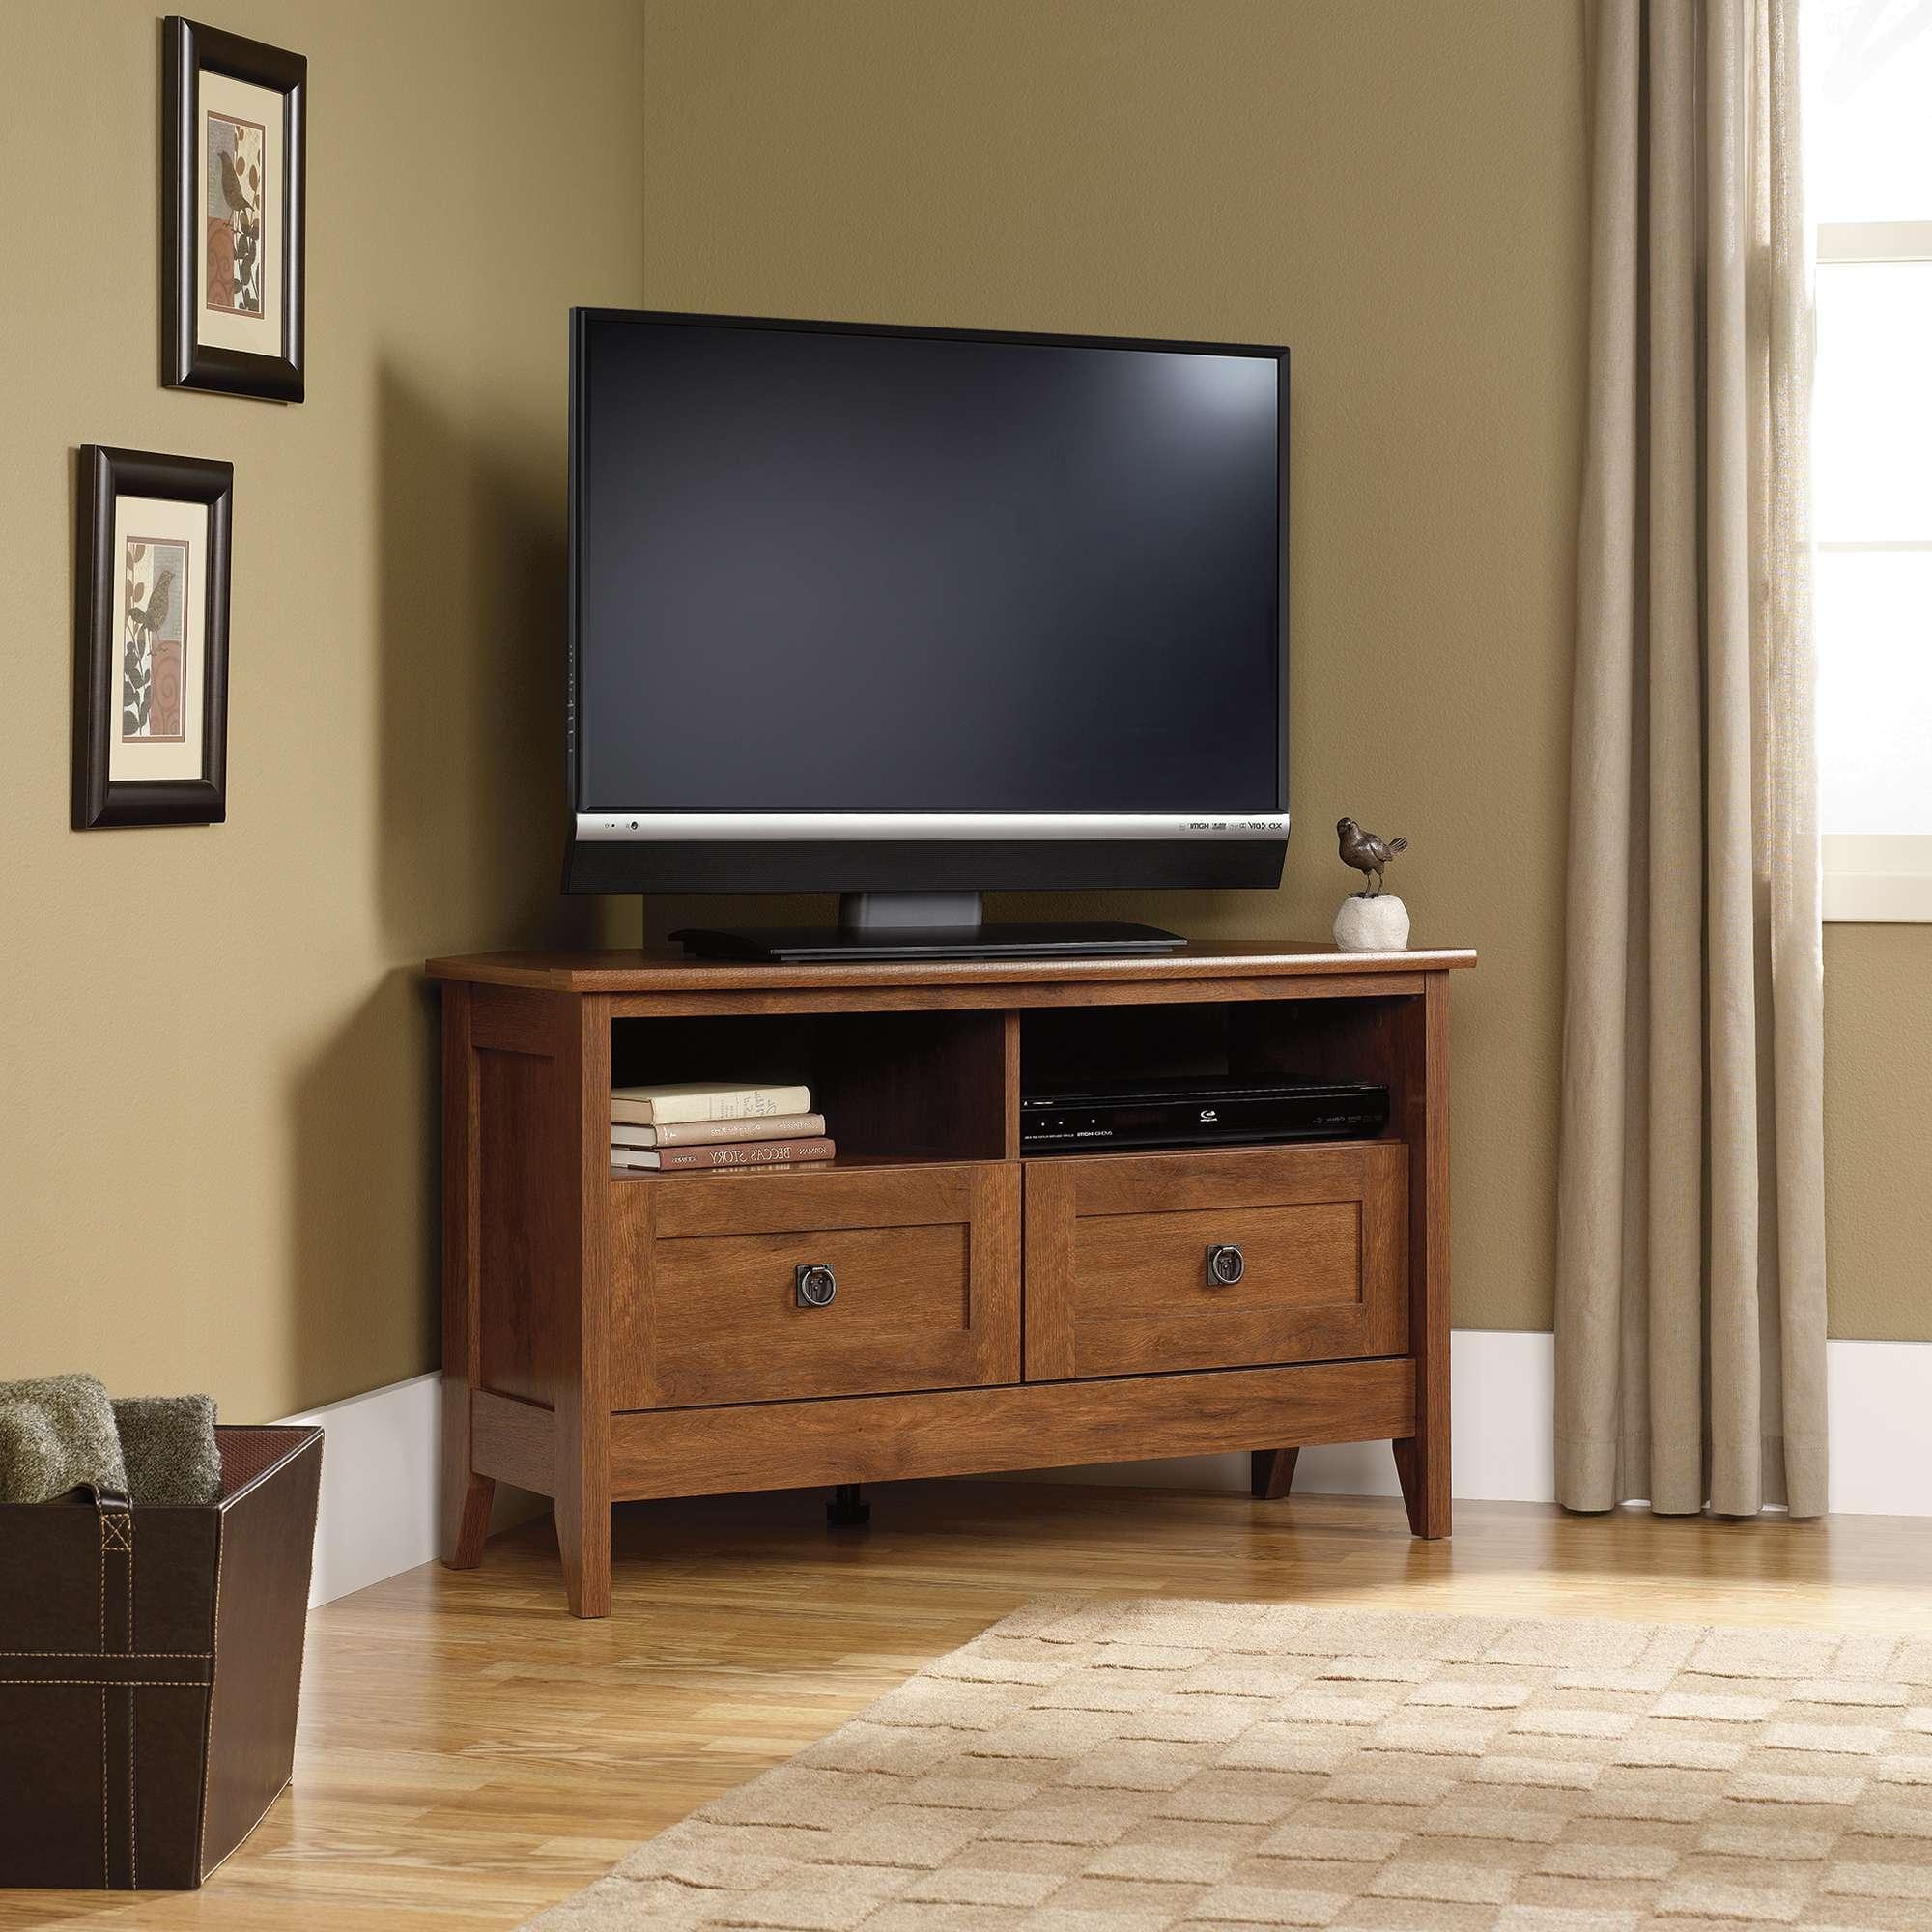 Sauder Select | Corner Tv Stand | 410627 | Sauder Within Oak Corner Tv Stands For Flat Screens (View 3 of 15)